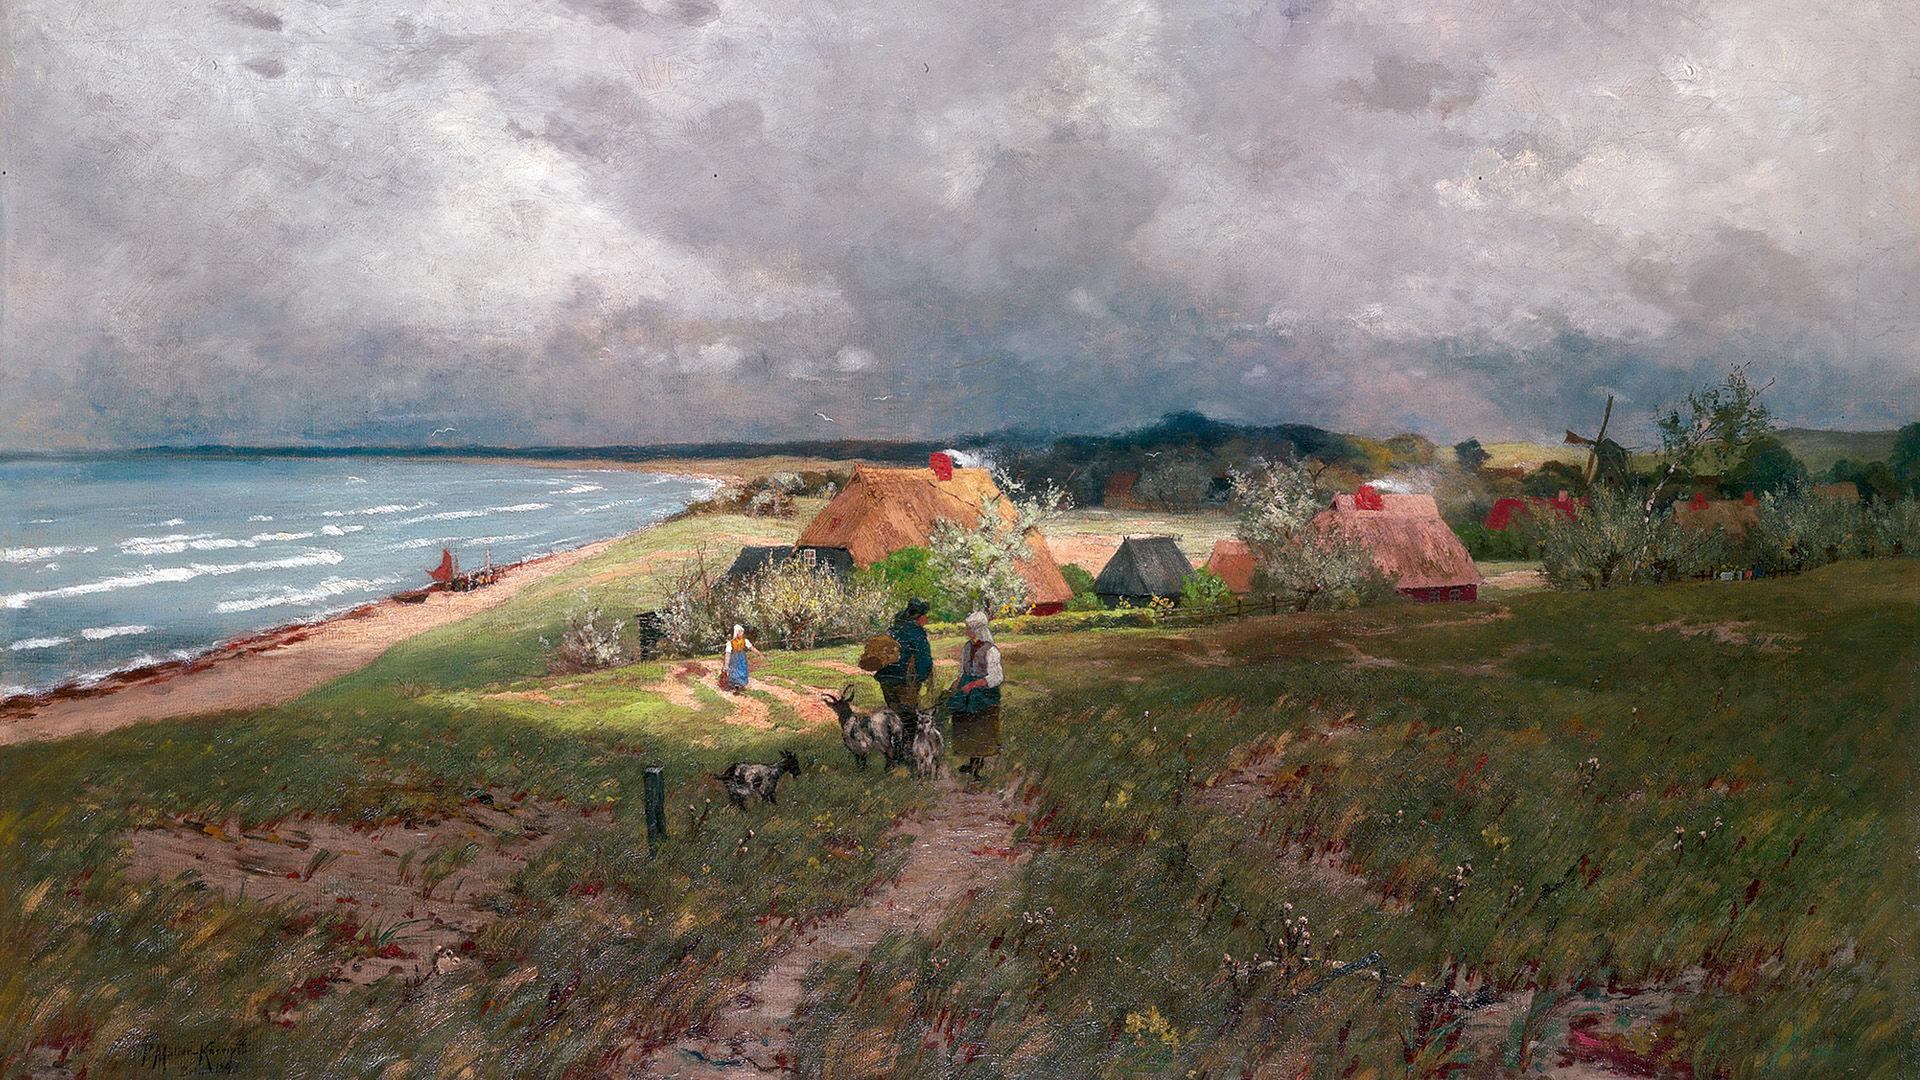 125 Jahre Künstlerkolonie - Ostseebad Ahrenshoop